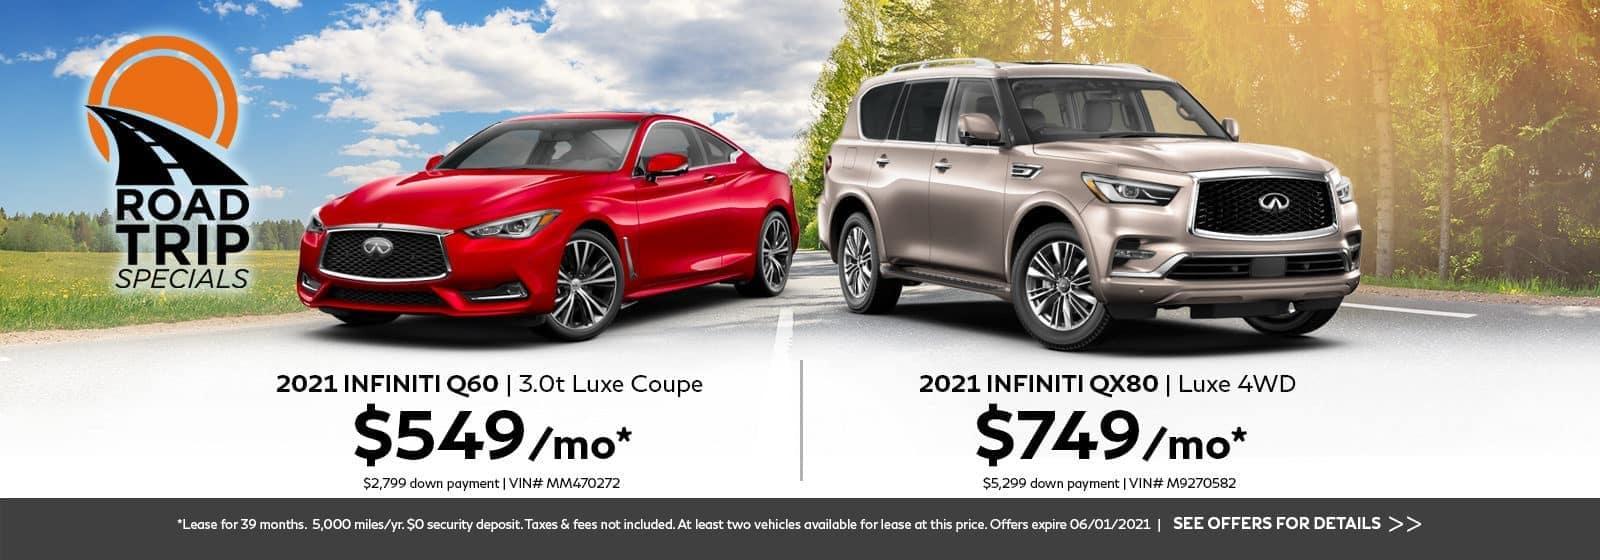 2021 INFINITI Q60 and 2021 INFINITI QX80